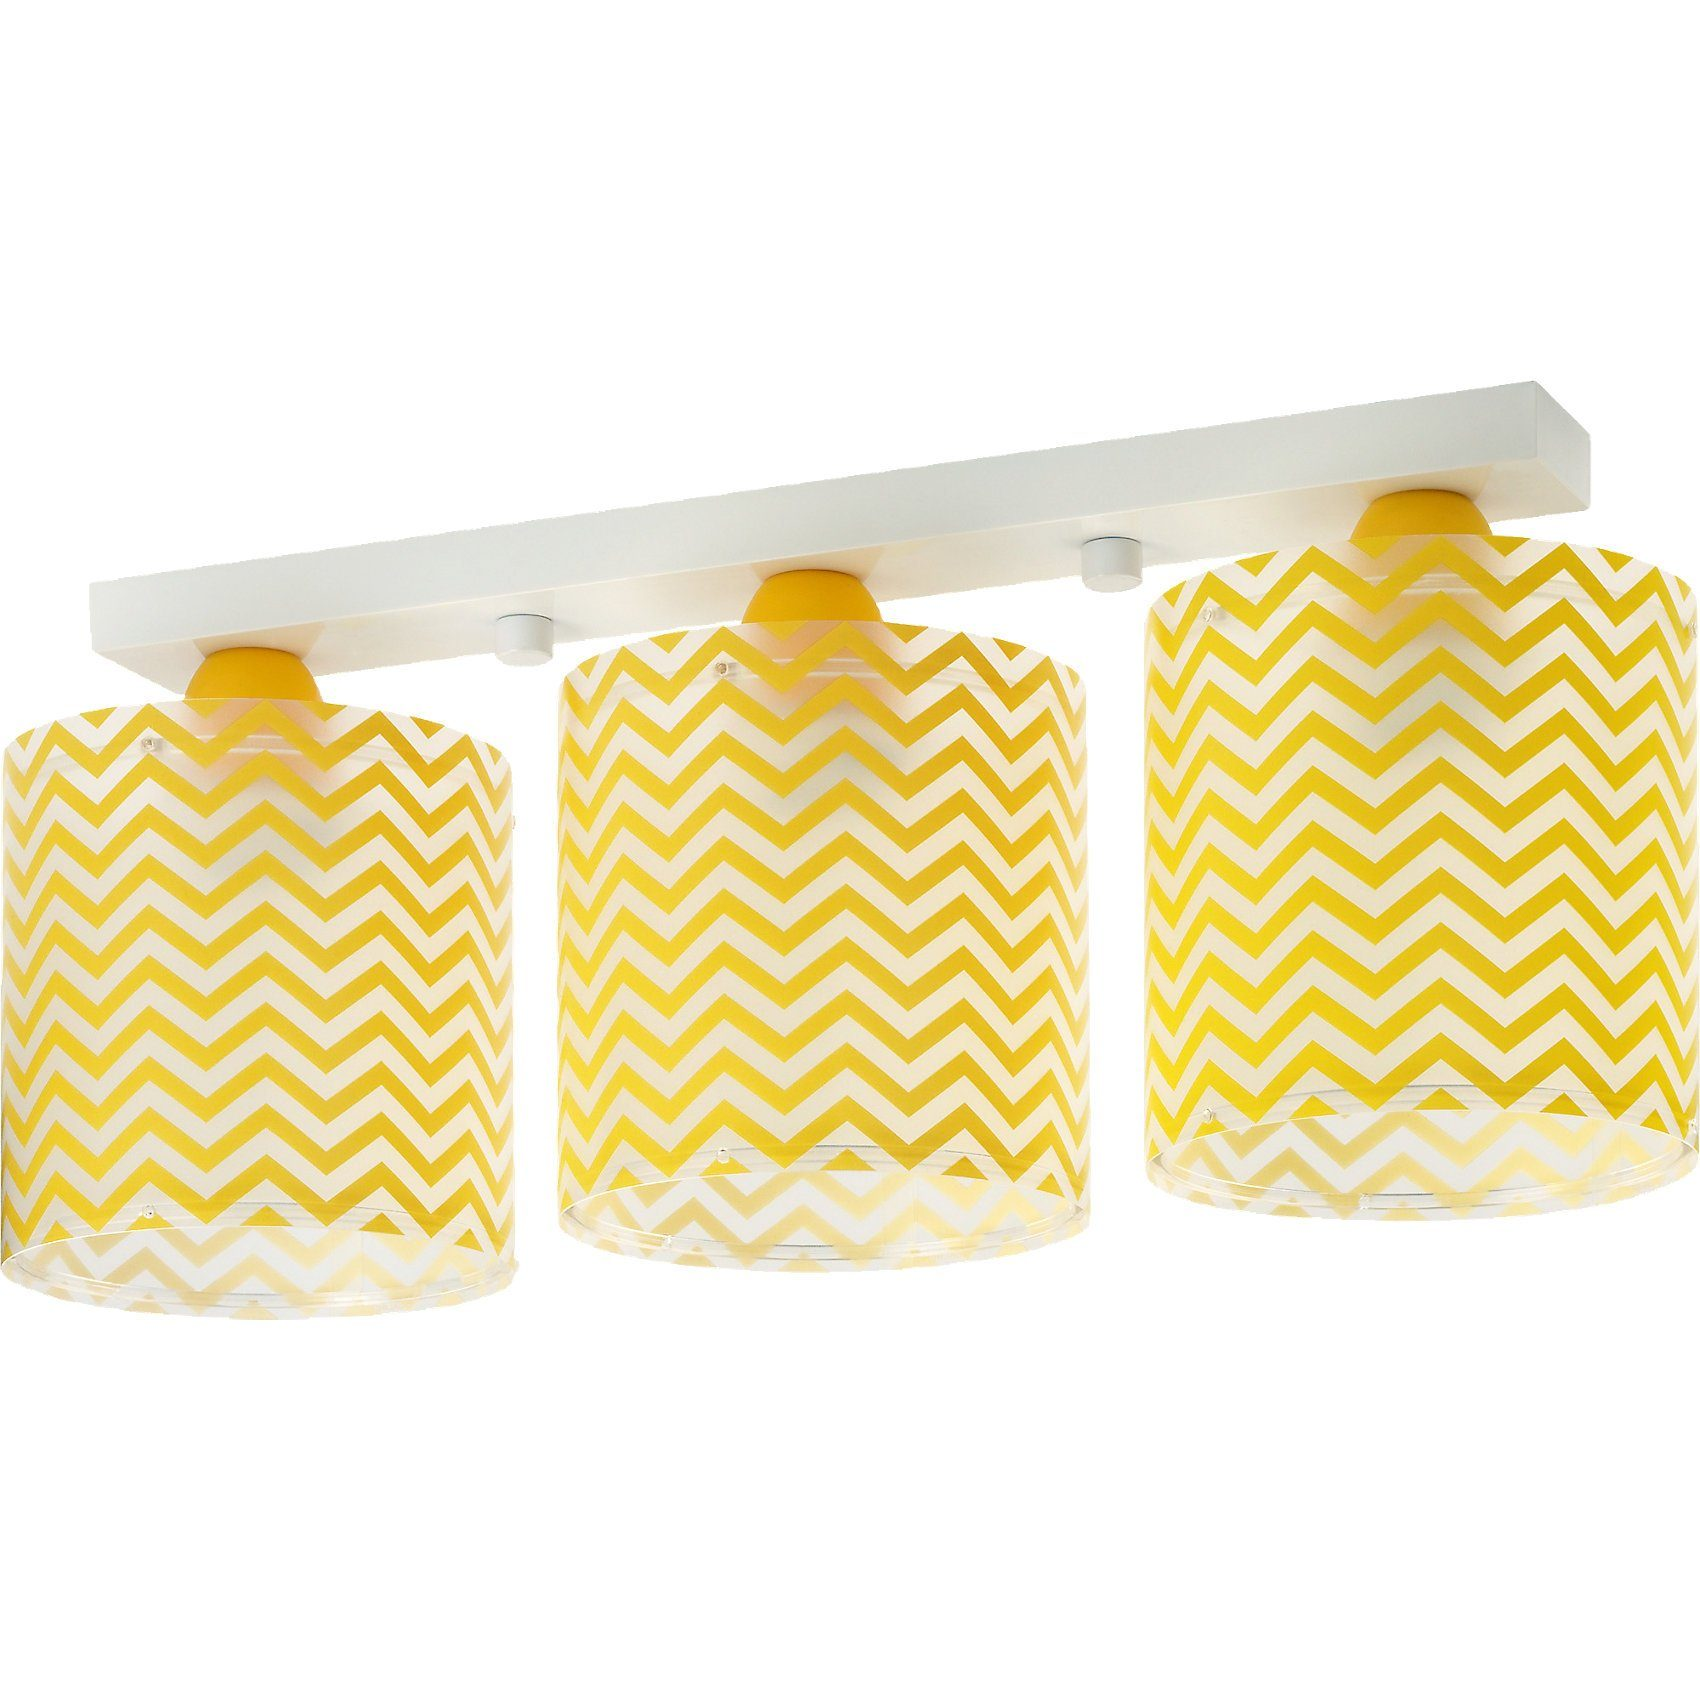 Dalber Deckenlampe Zickzack, gelb